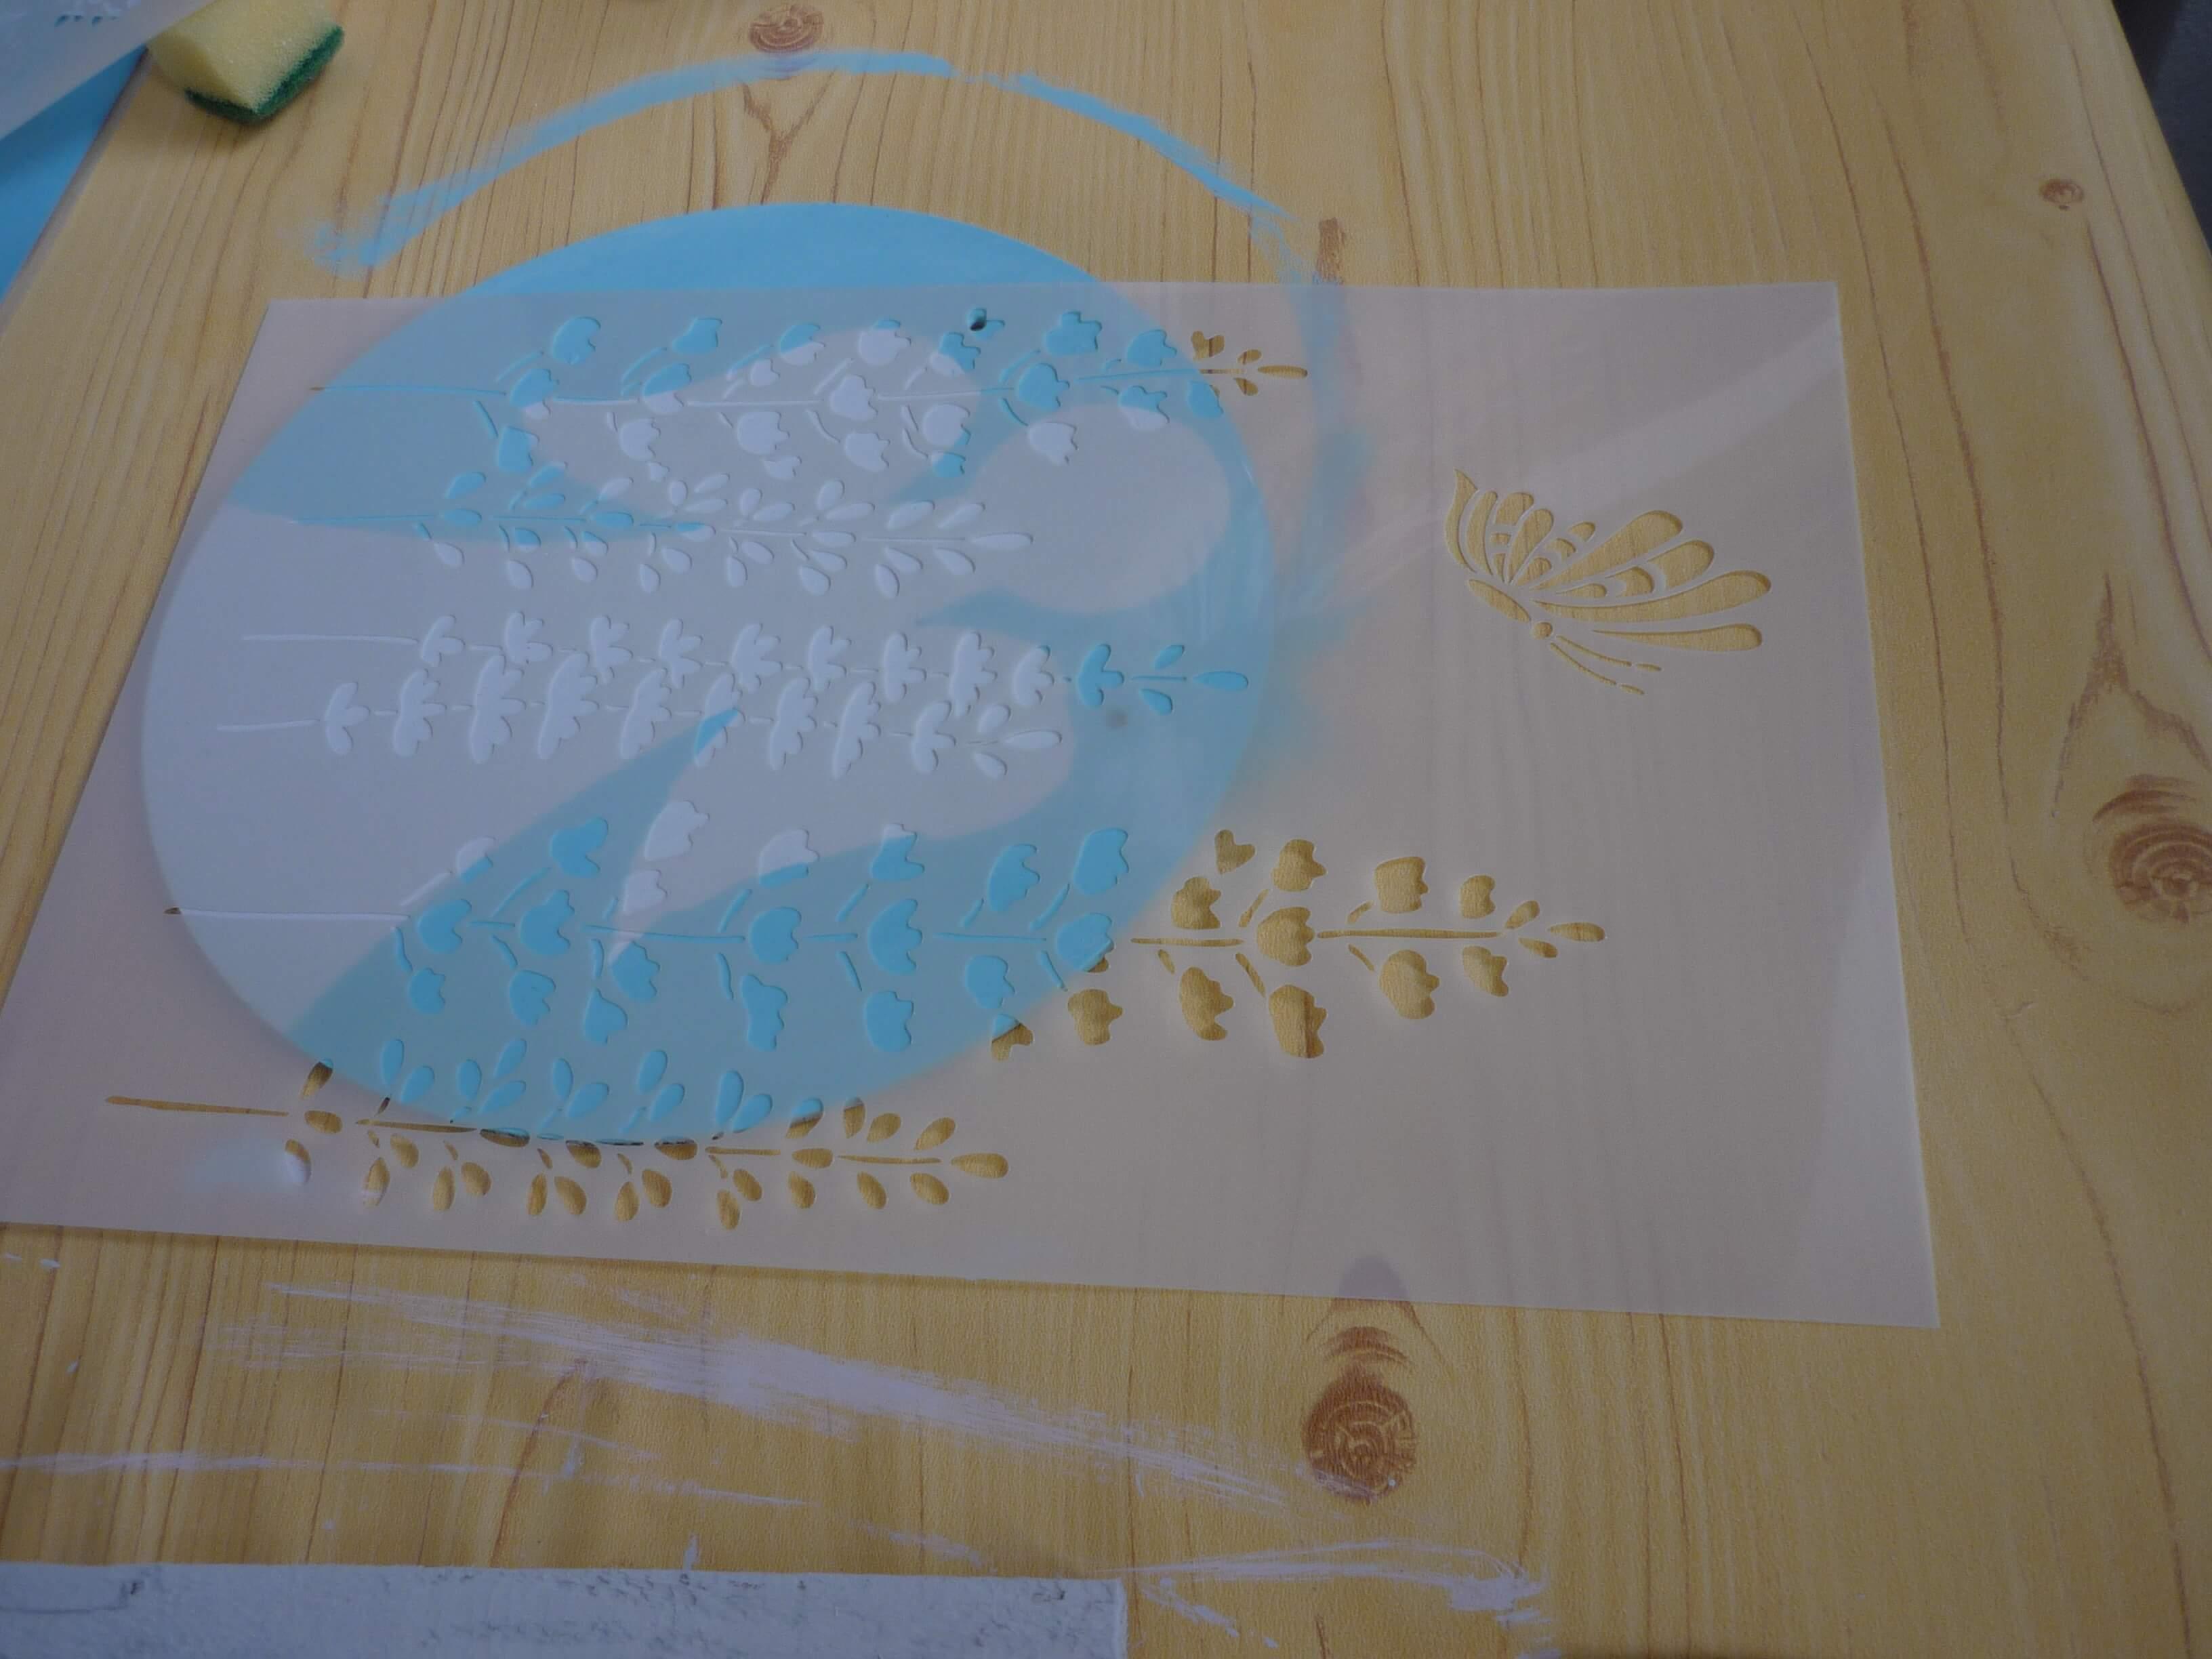 1.Workshop s Kriedovymi Farbamy VK (4).JPG